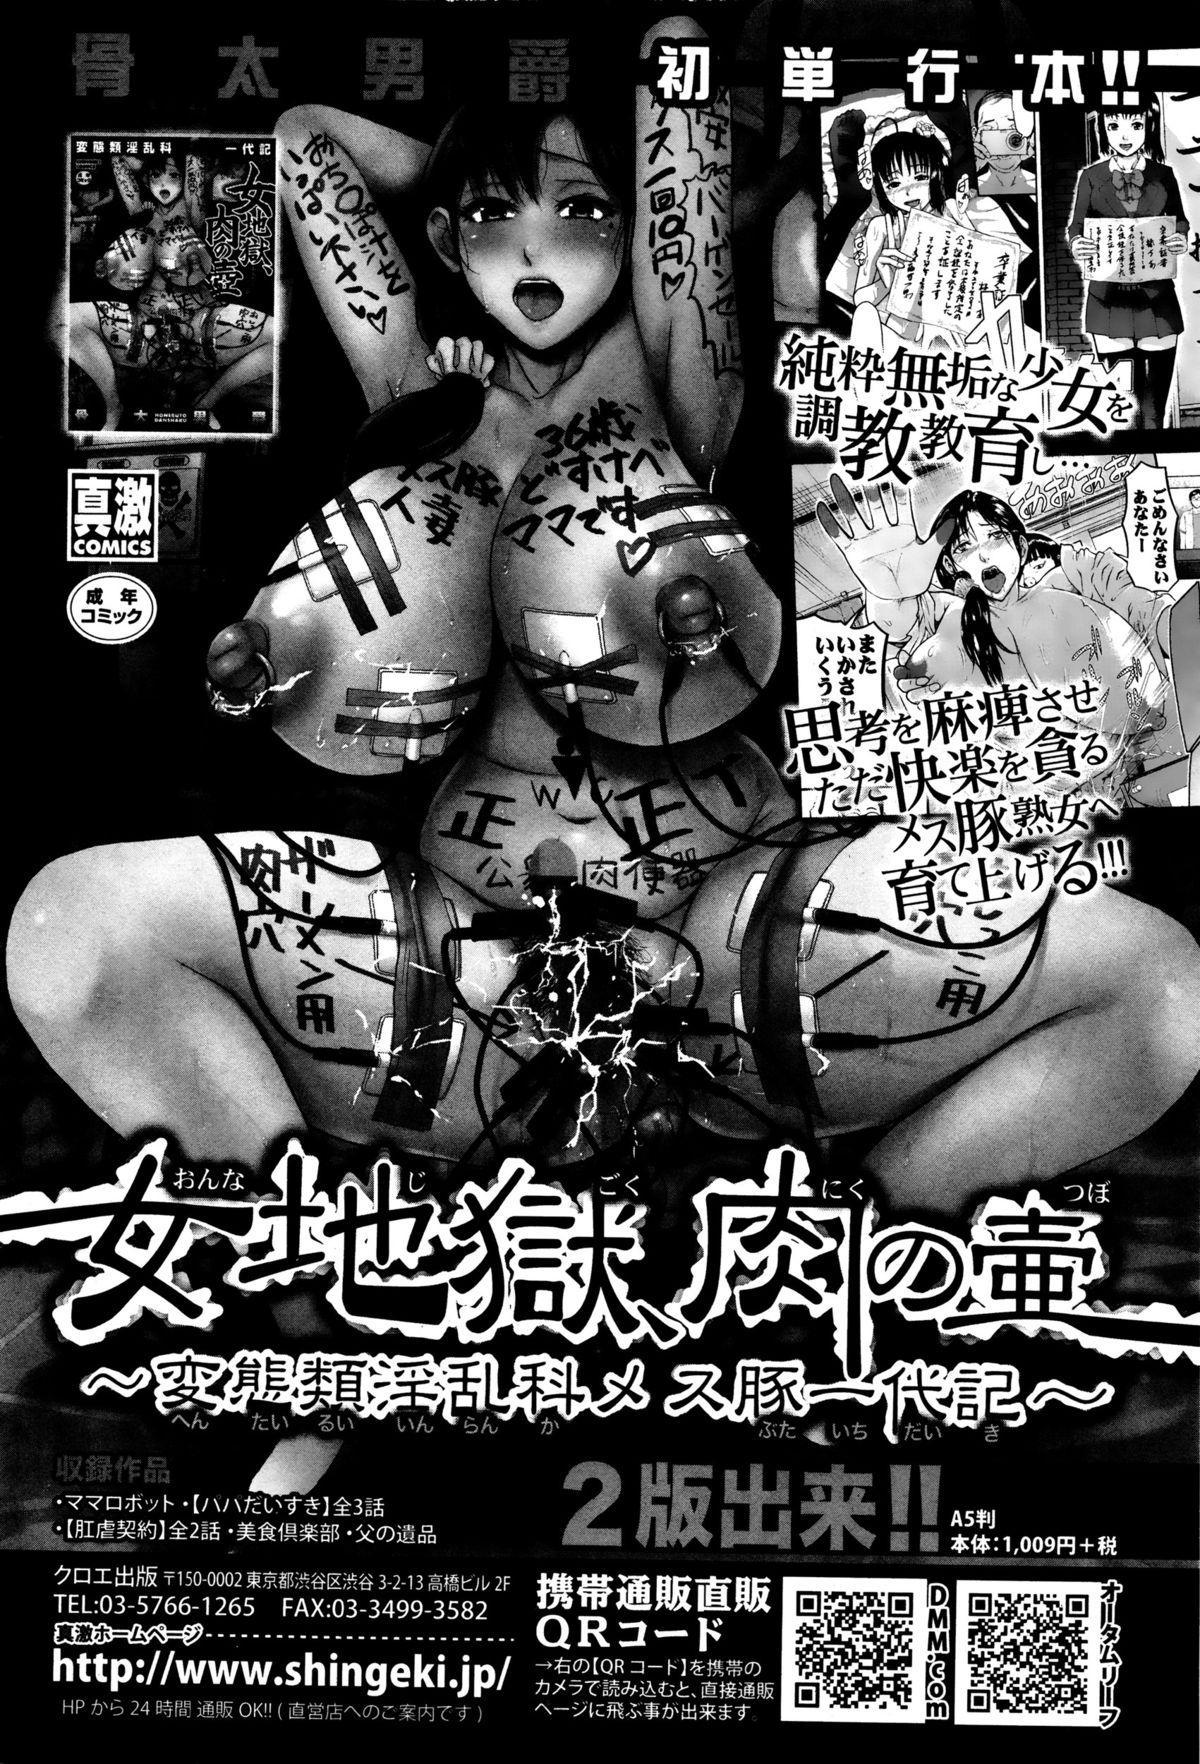 COMIC Shingeki 2016-01 123